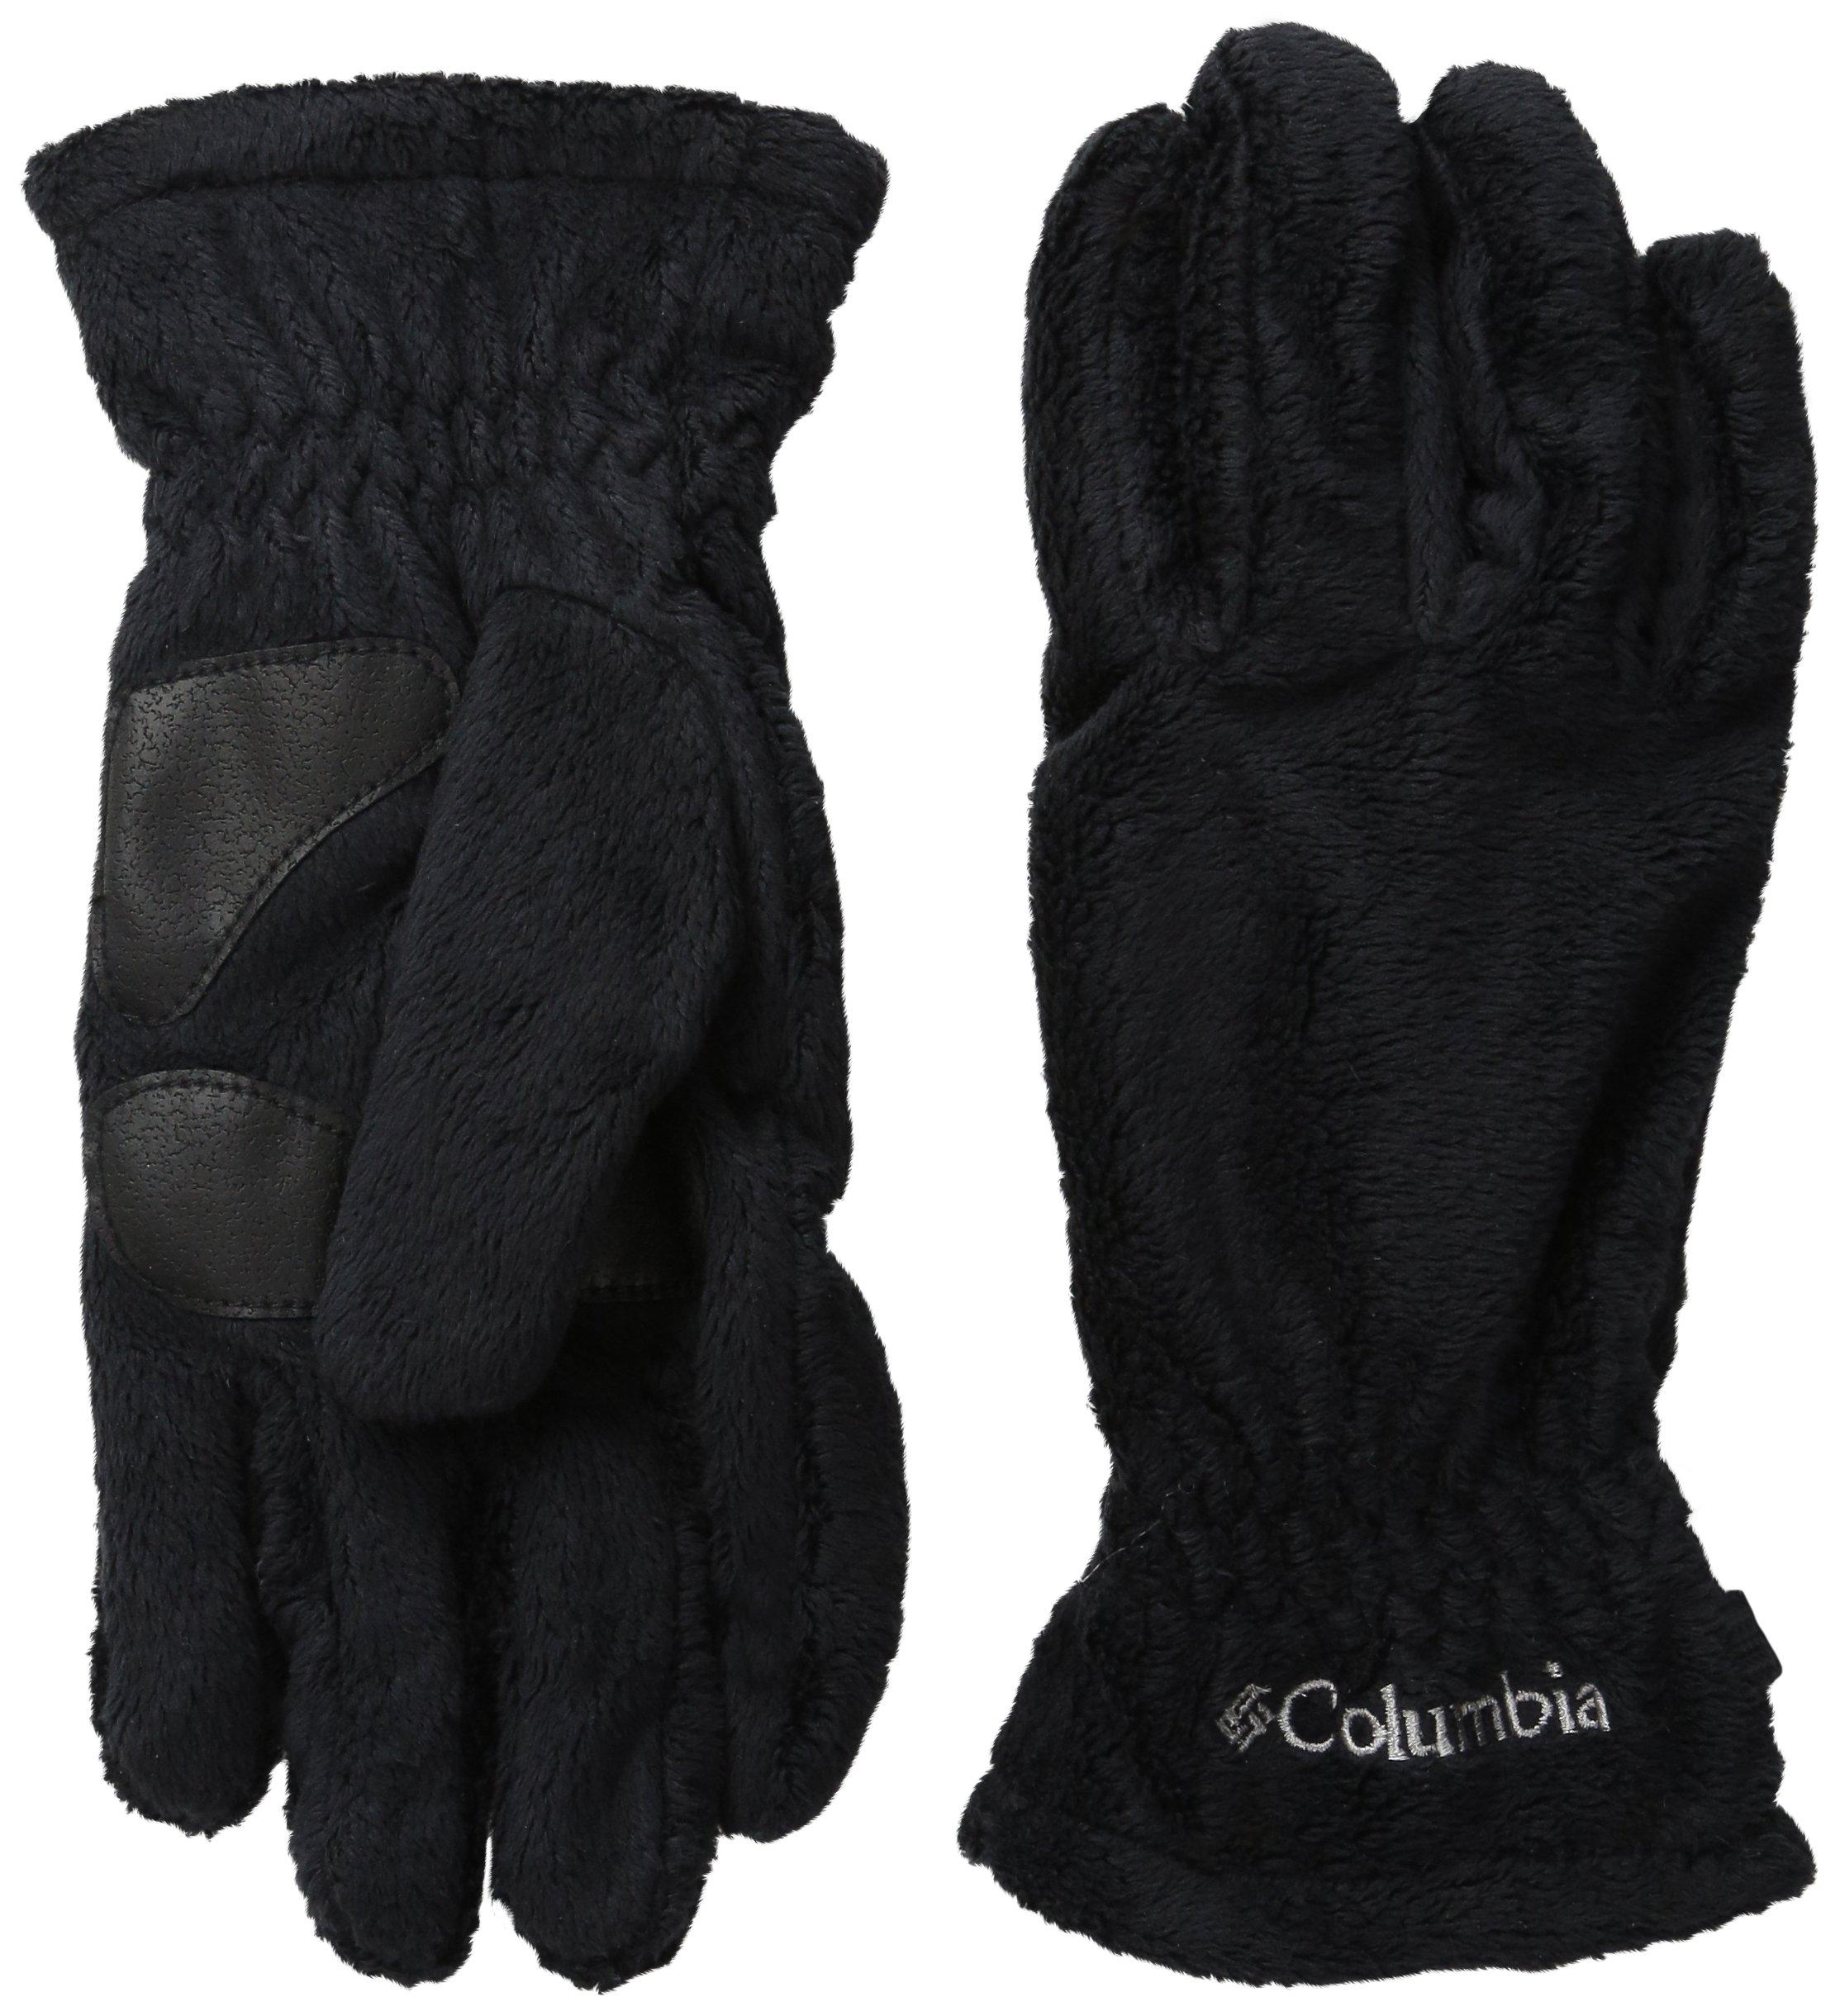 Columbia Women's Hot Dots Glove, Black, X-Large